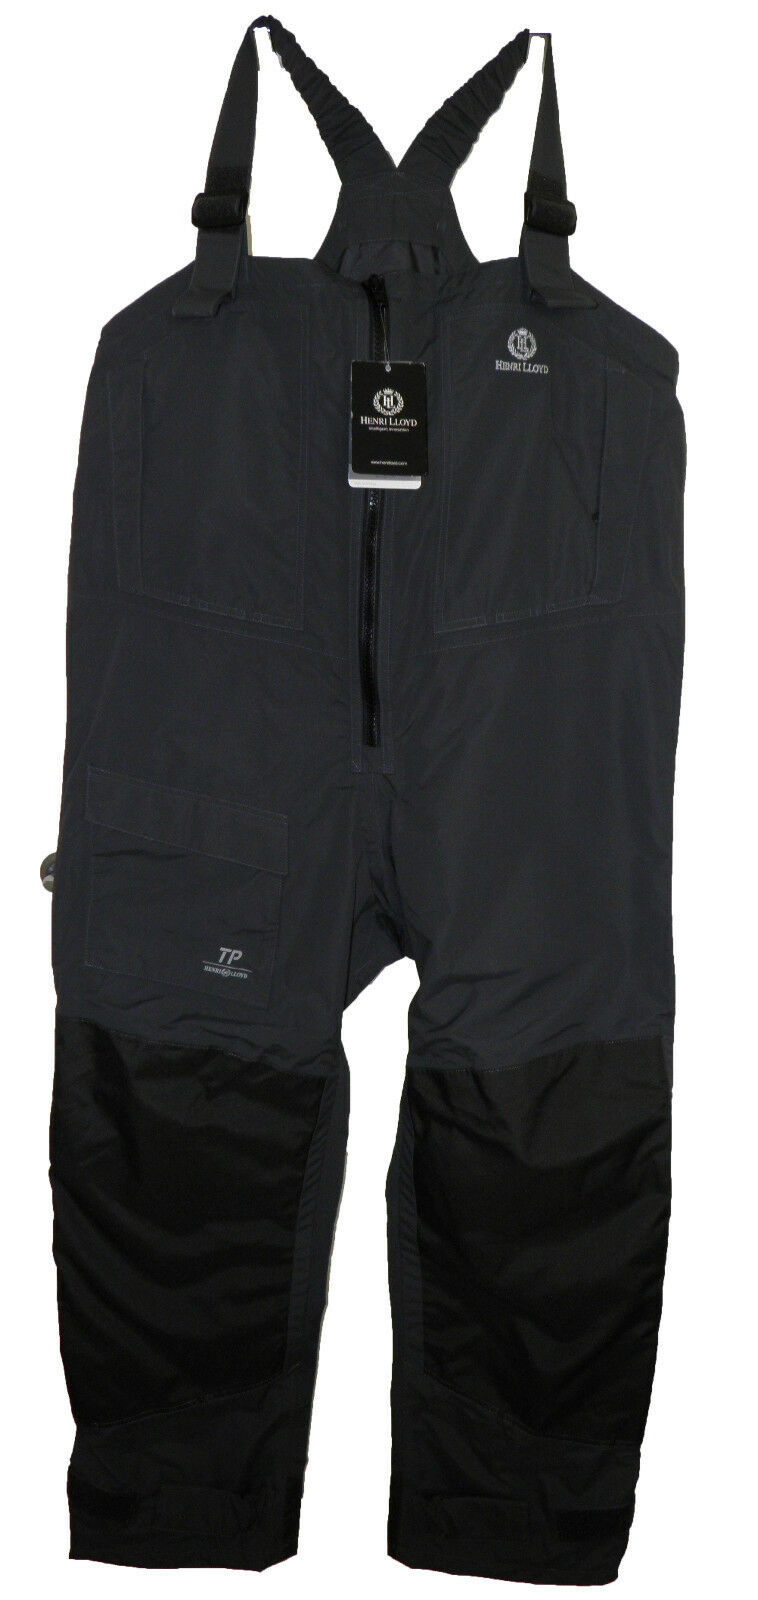 Henri Lloyd 100% Waterproof trousers Sail Snowboarding Fishing XXL